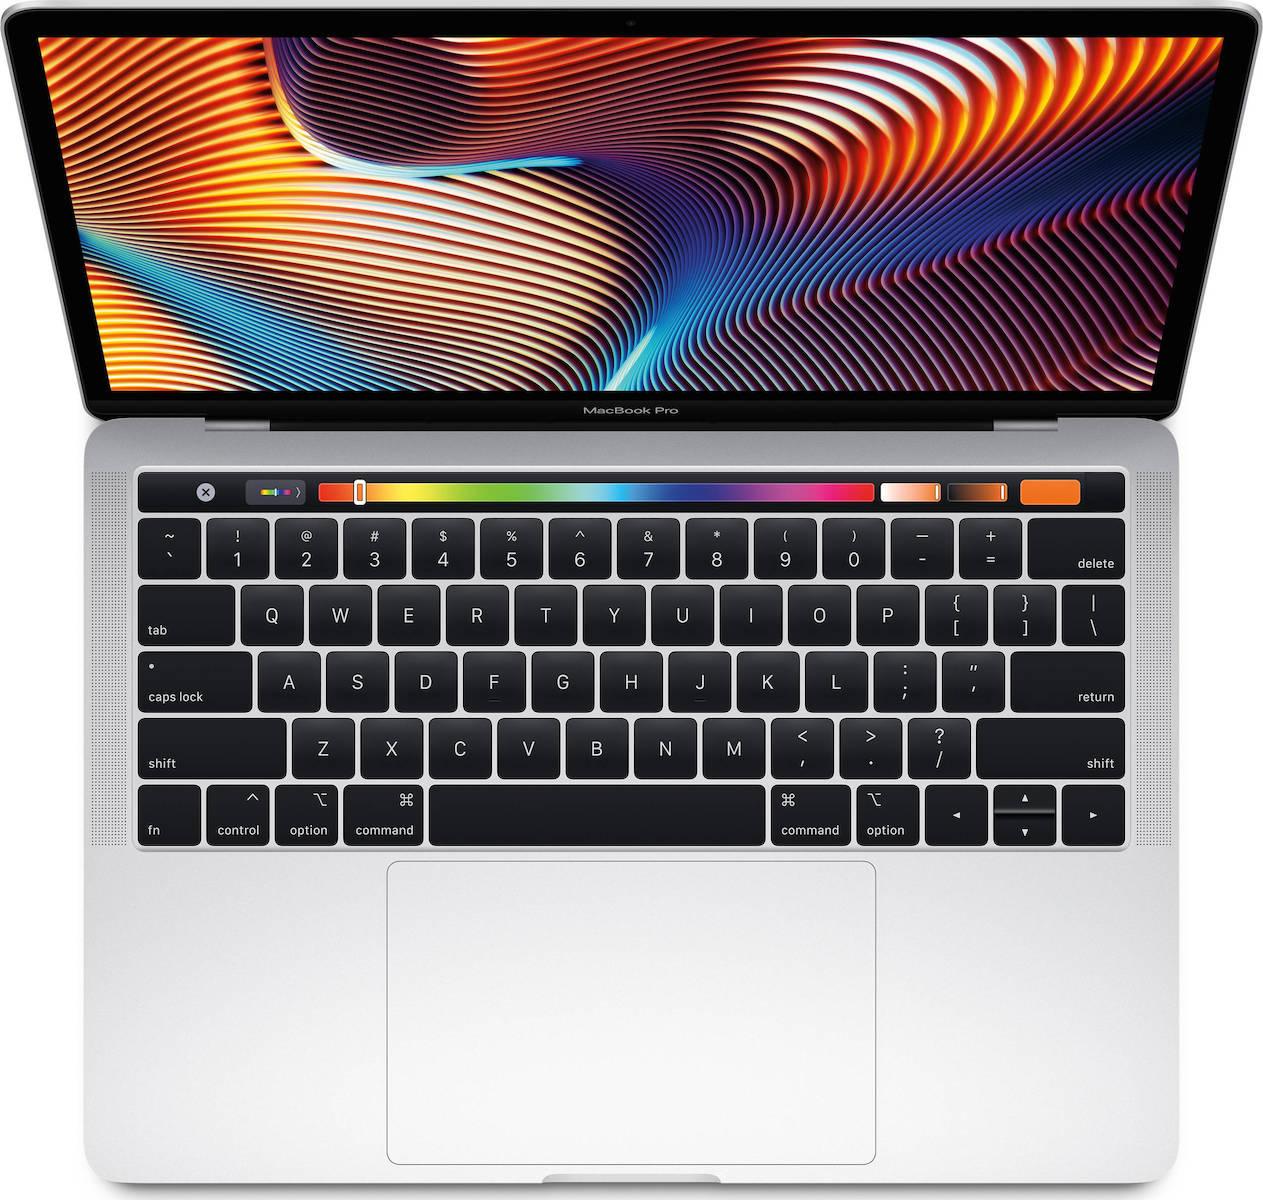 Apple MacBook Pro MR9U2 13.3'' 2.3GHz i5/8GB/256GB With Touch Bar 2018 Silver English Keyboard Με Αντάπτορα Πληρωμή έως 24 δόσεις